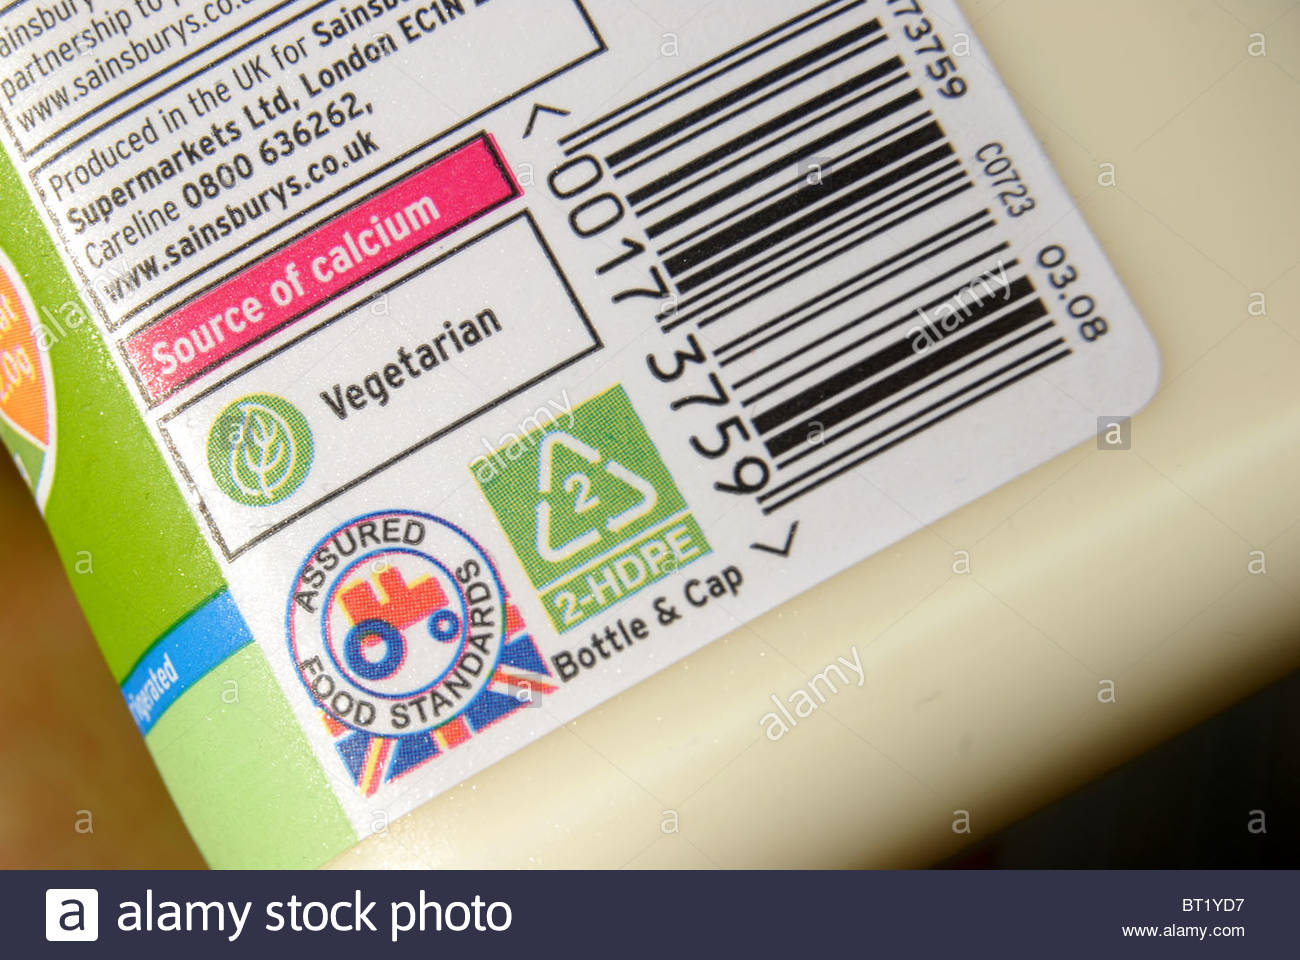 Organic Food Durham